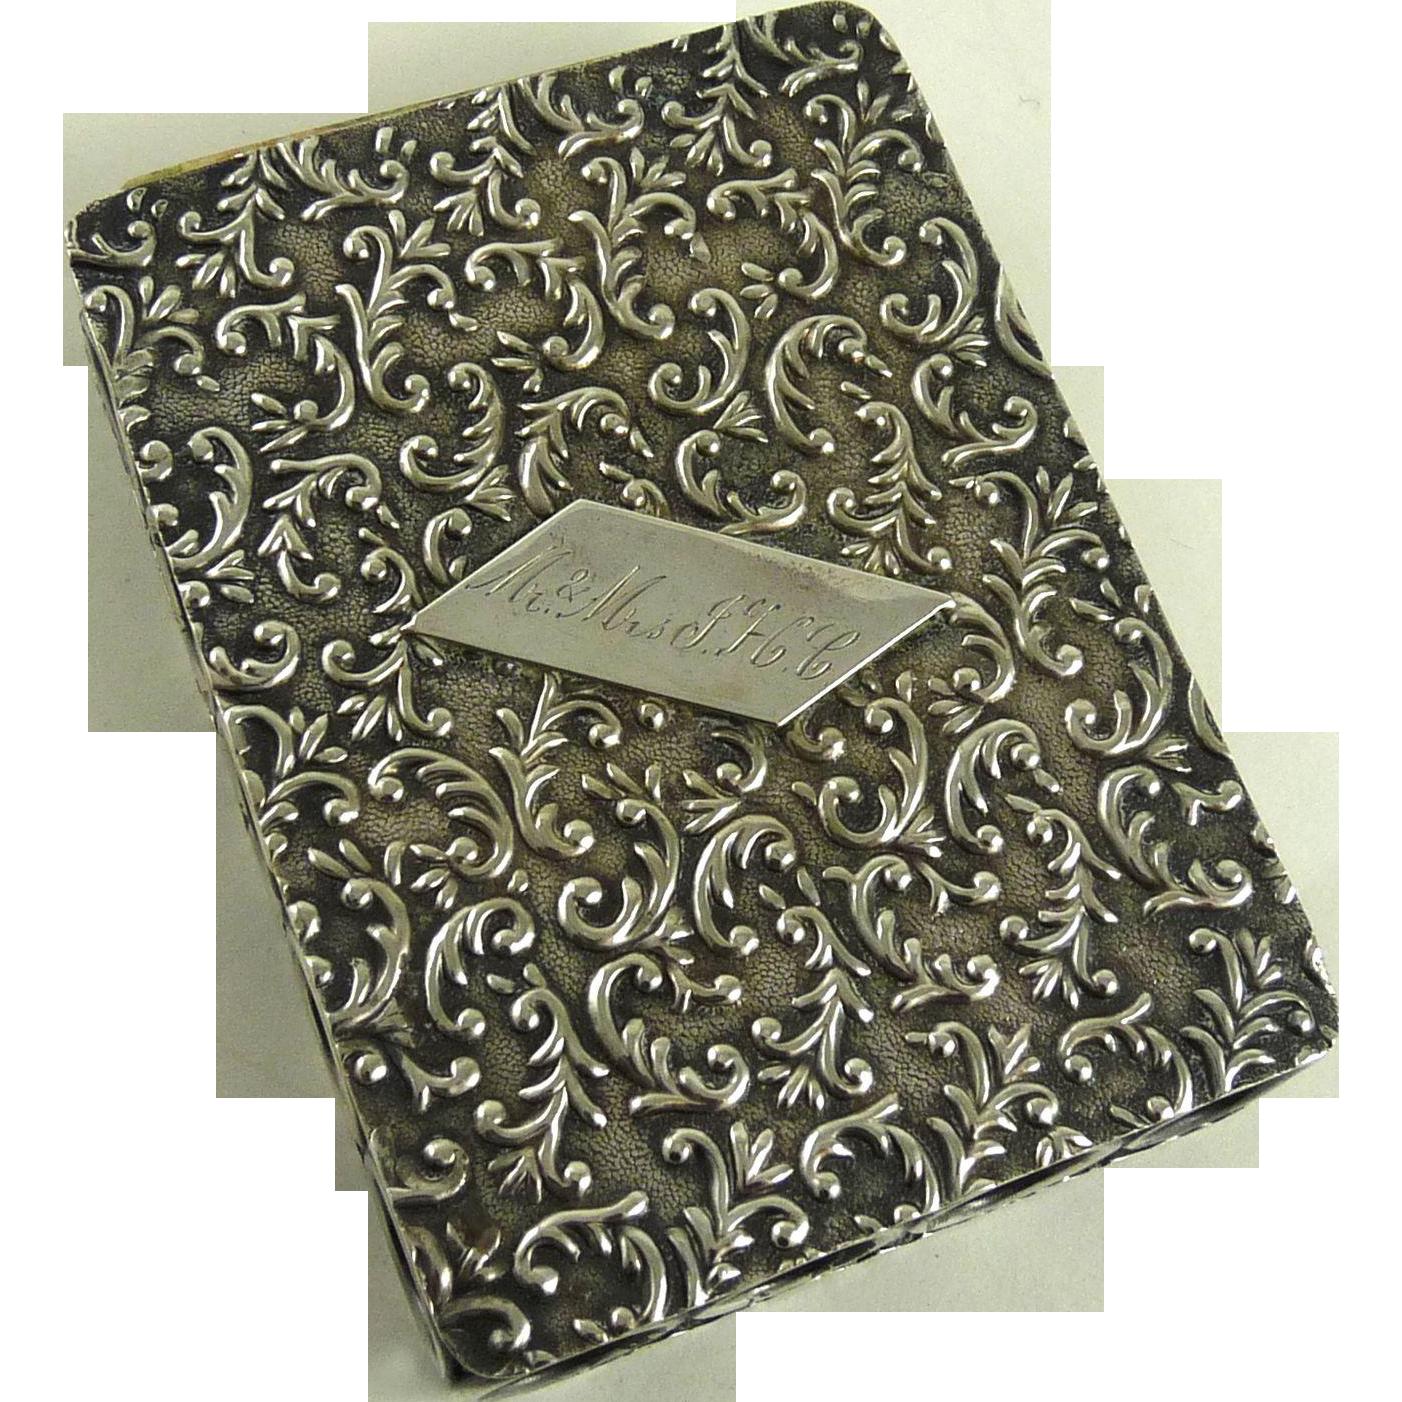 Antique Art Nouveau Sterling Silver Playing Card Case